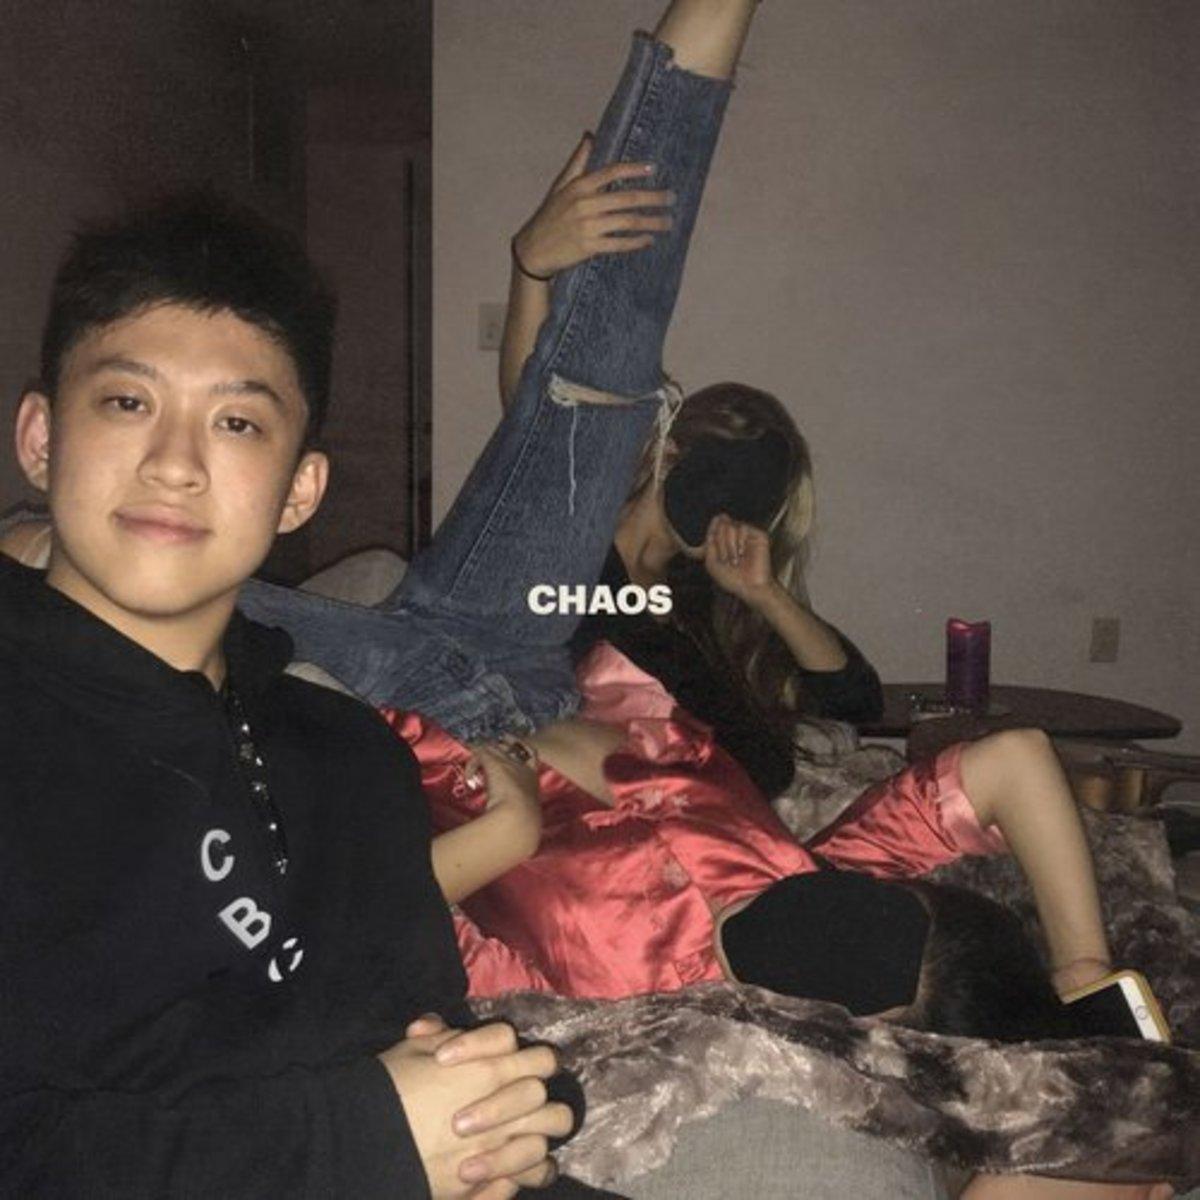 rich-chigga-chaos.jpg